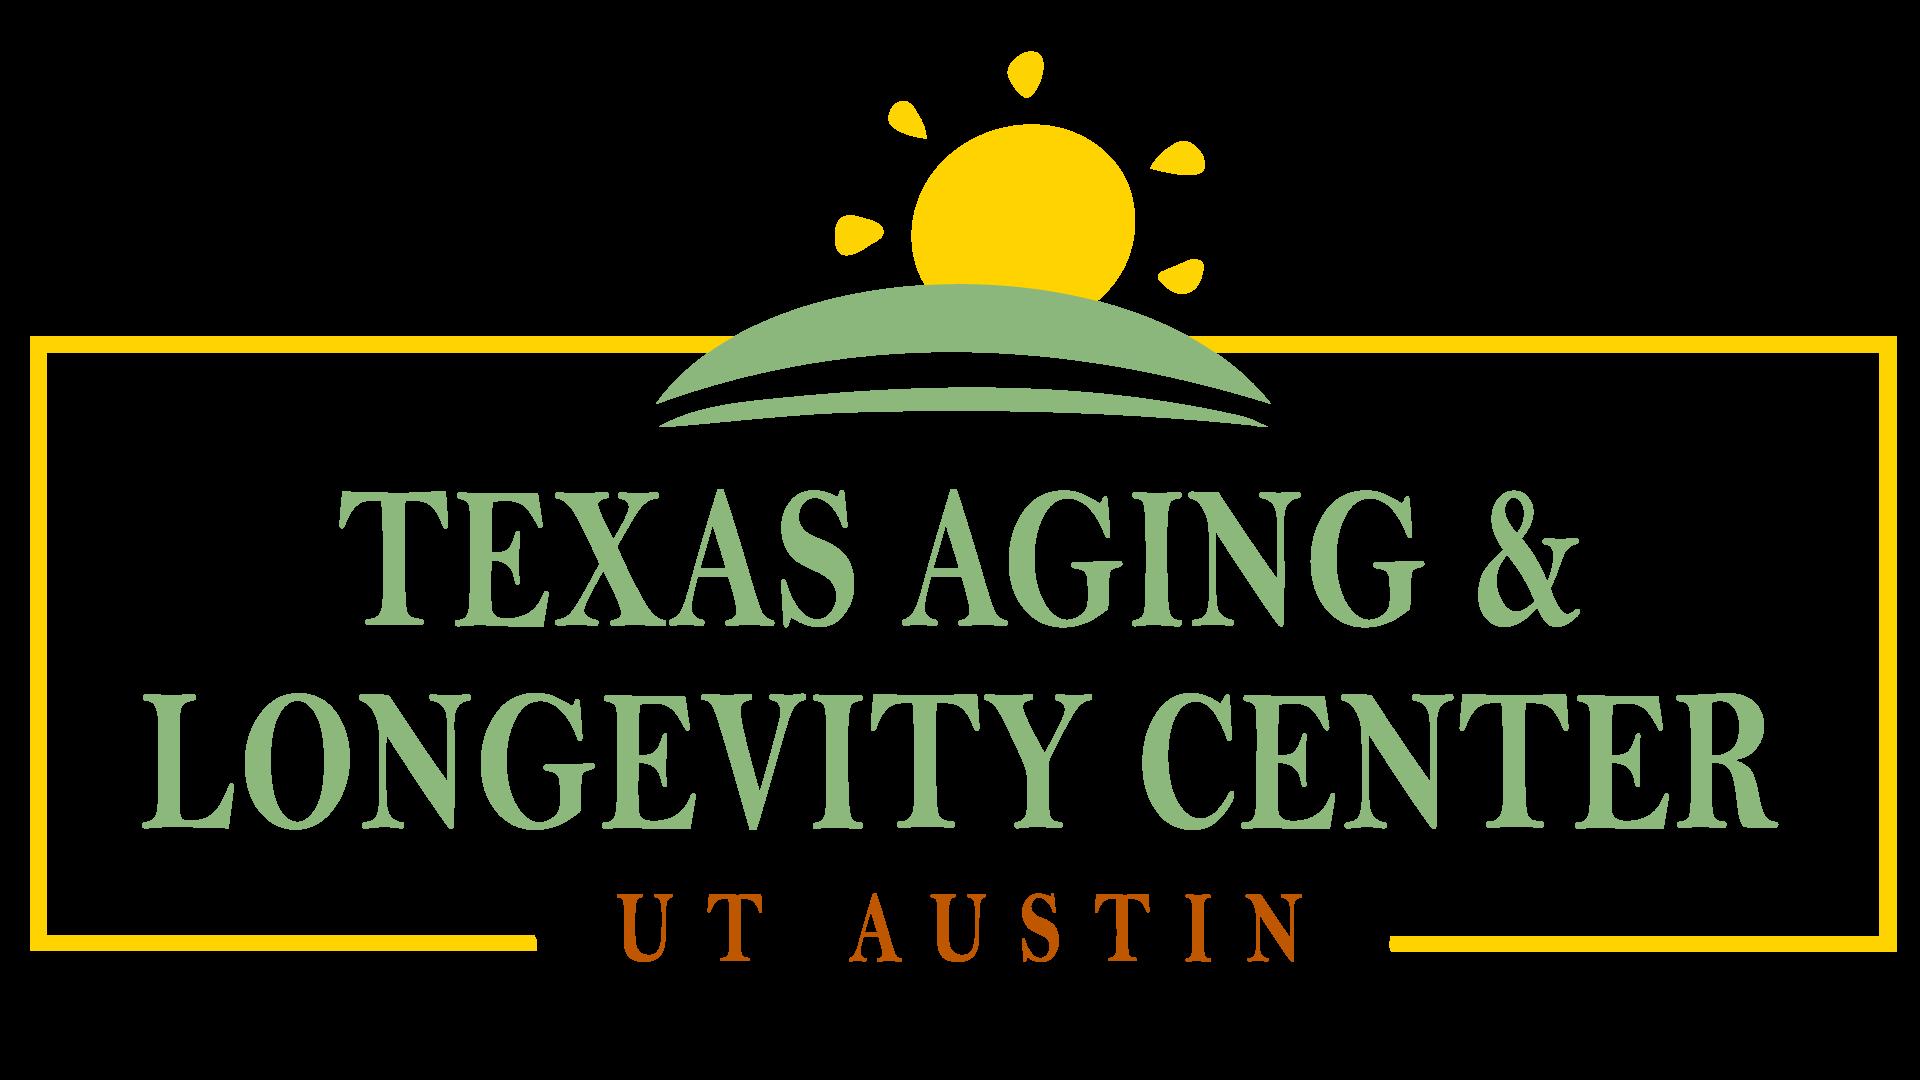 Texas Aging & Longevity Center Kick-Off!